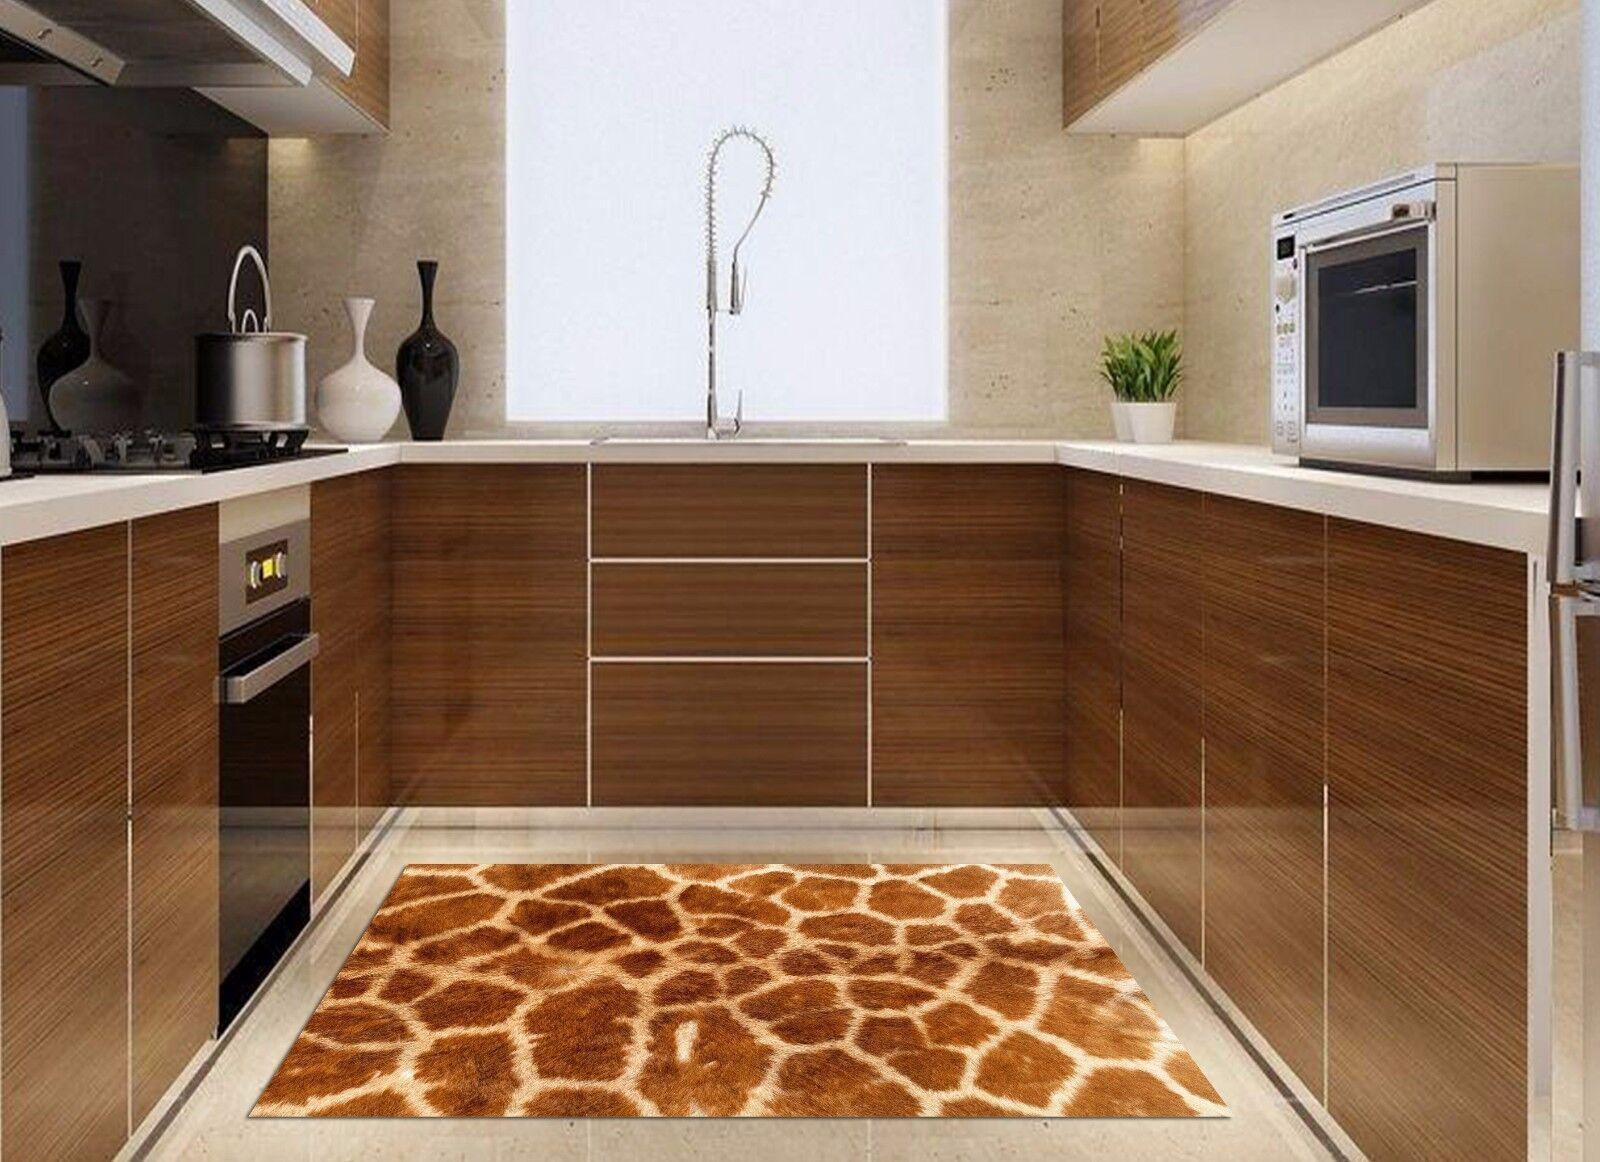 3D Leopard Texture 833 Kitchen Mat Floor Murals Wall Print Wall Deco UK Carly